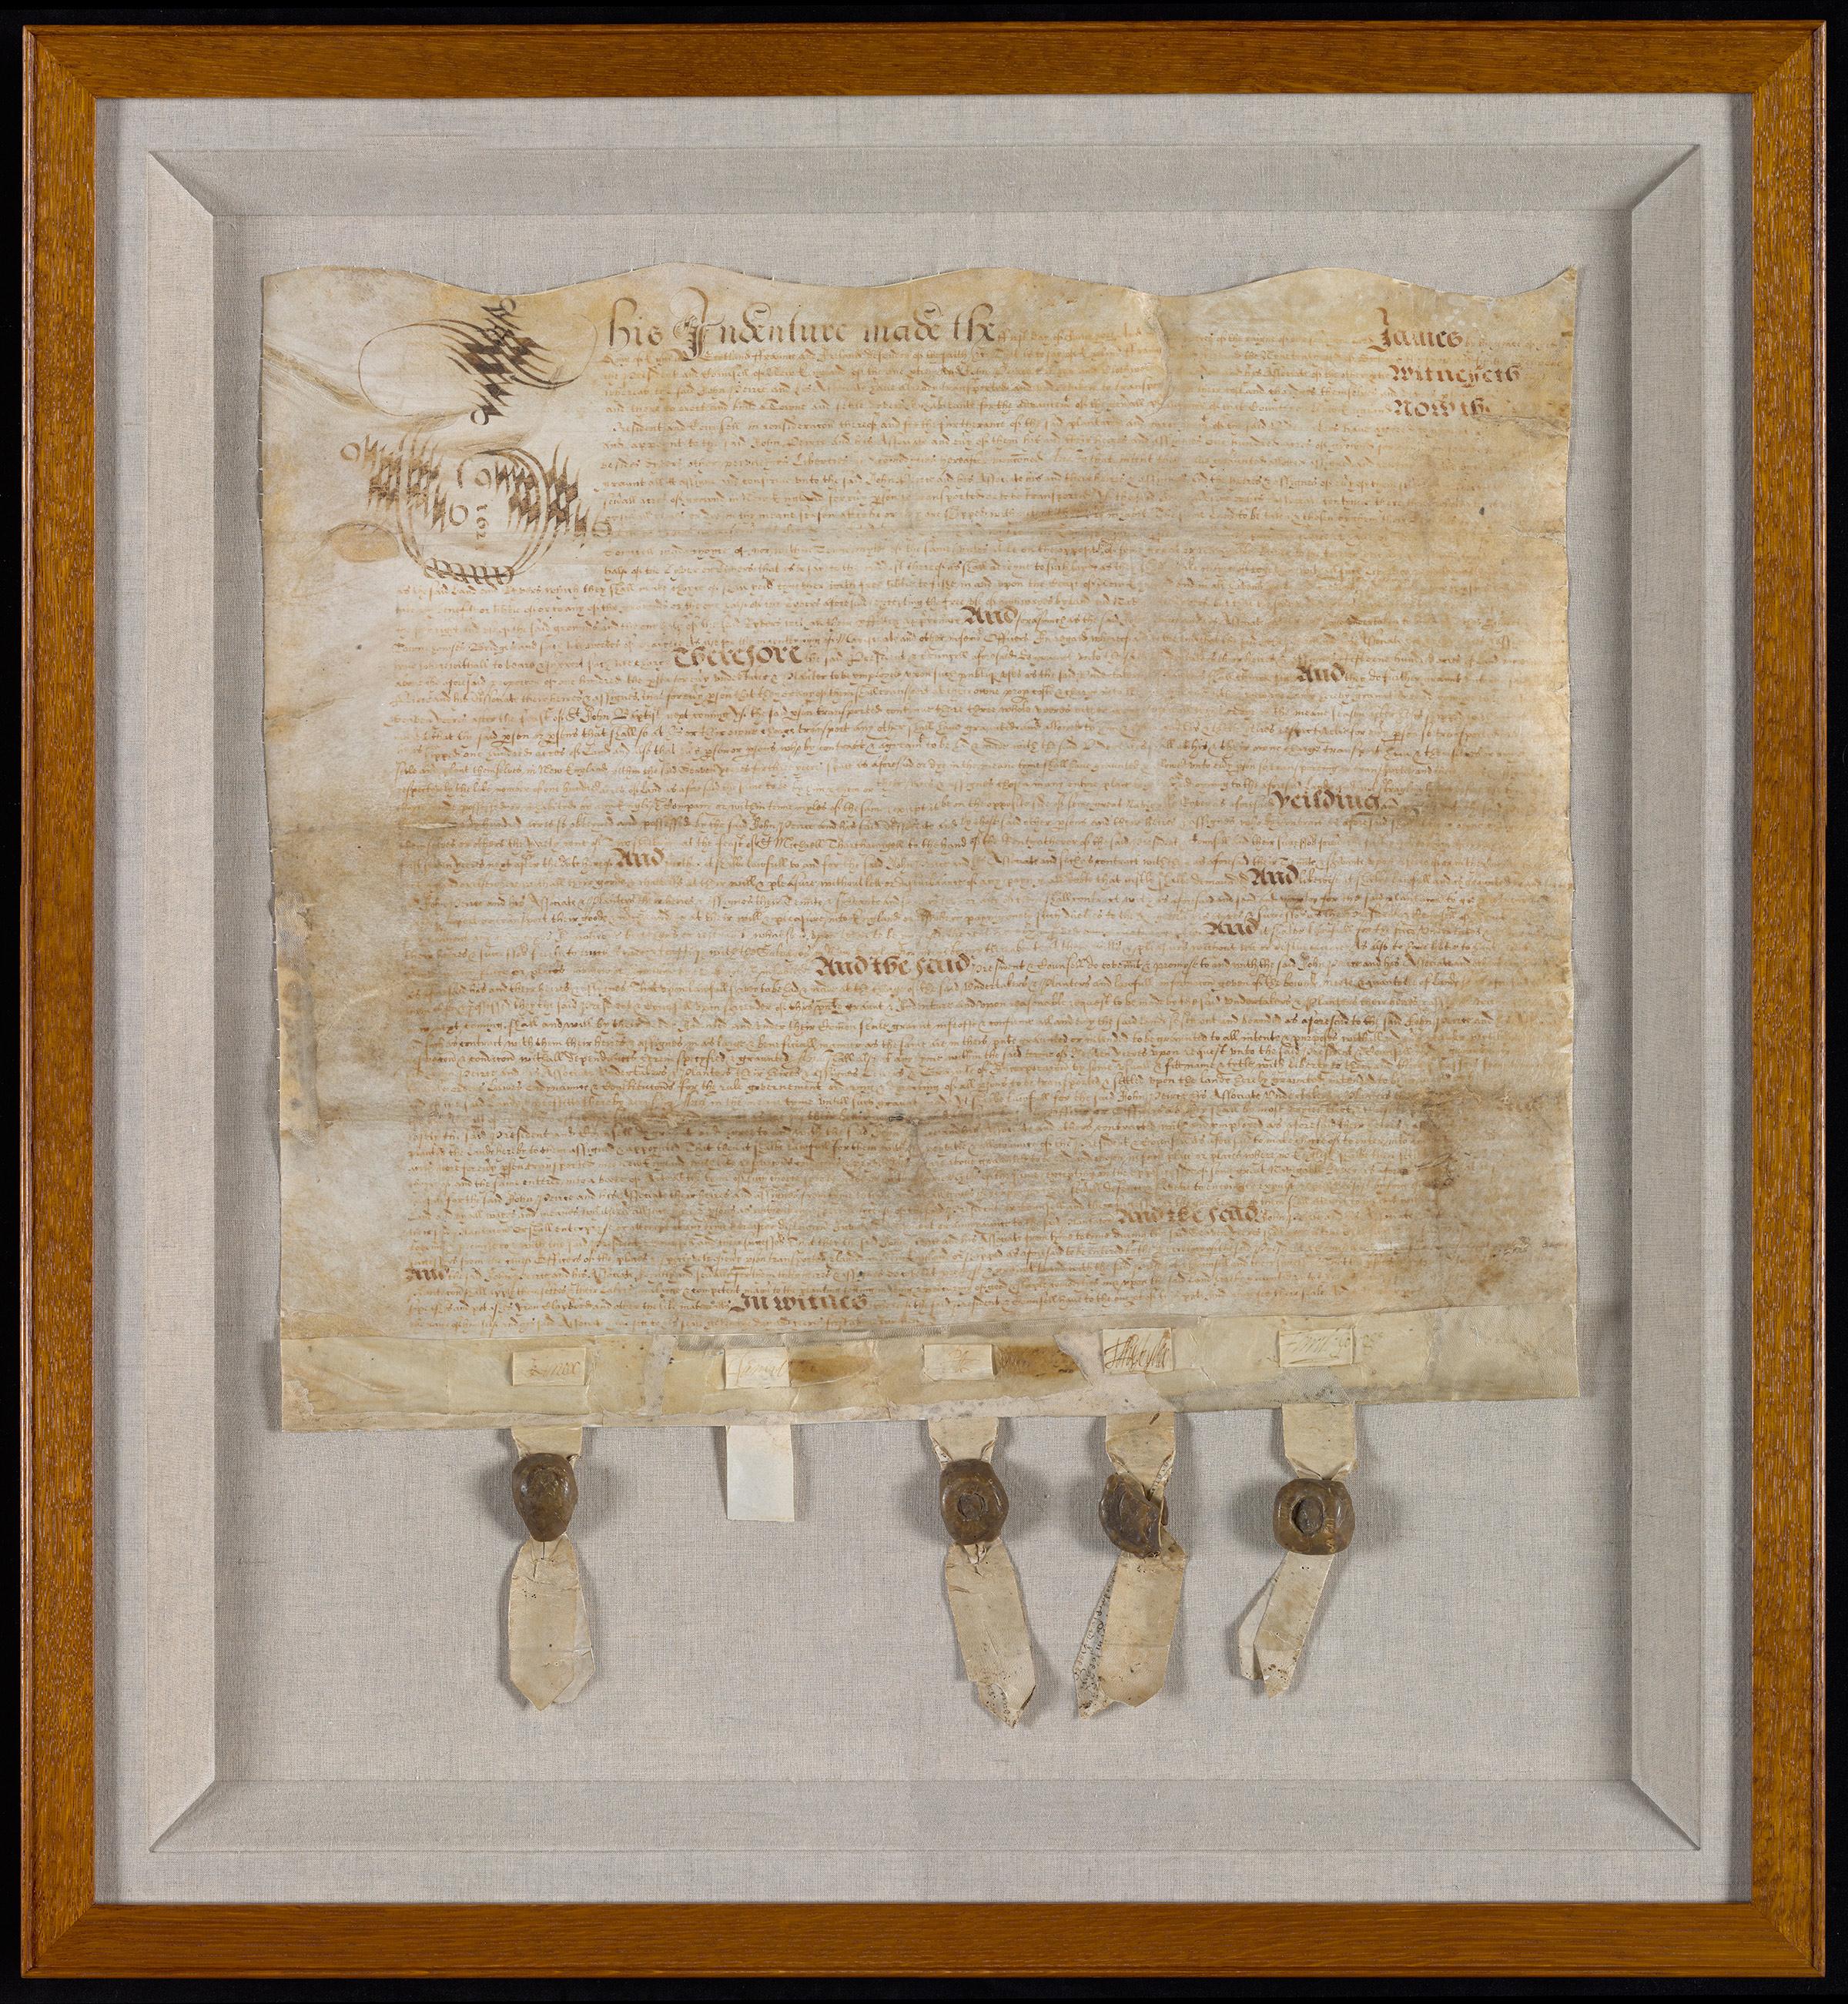 Second Peirce Patent, 1621